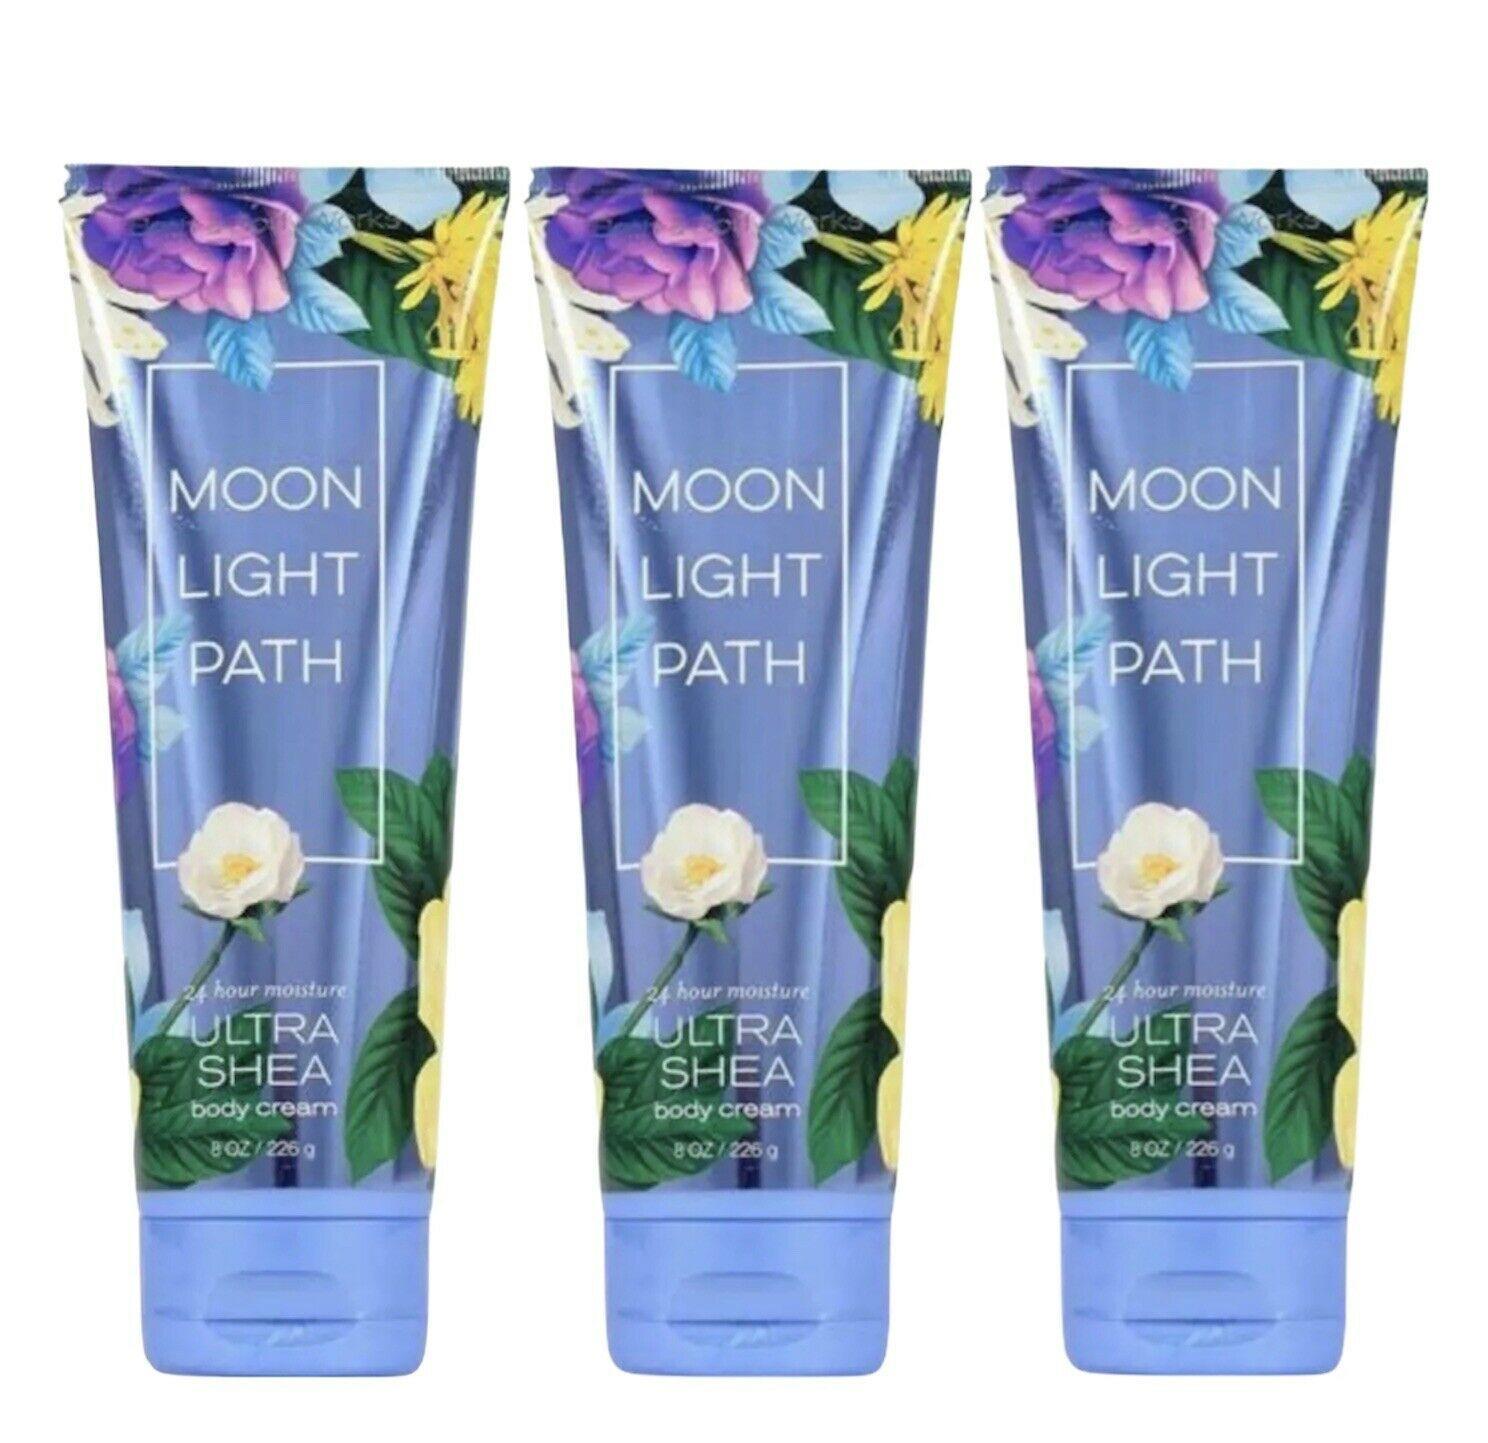 3-Pack Bath & Body Works MOONLIGHT PATH Ultra Shea Body Cream Lotion 8 oz 226 g - $44.50